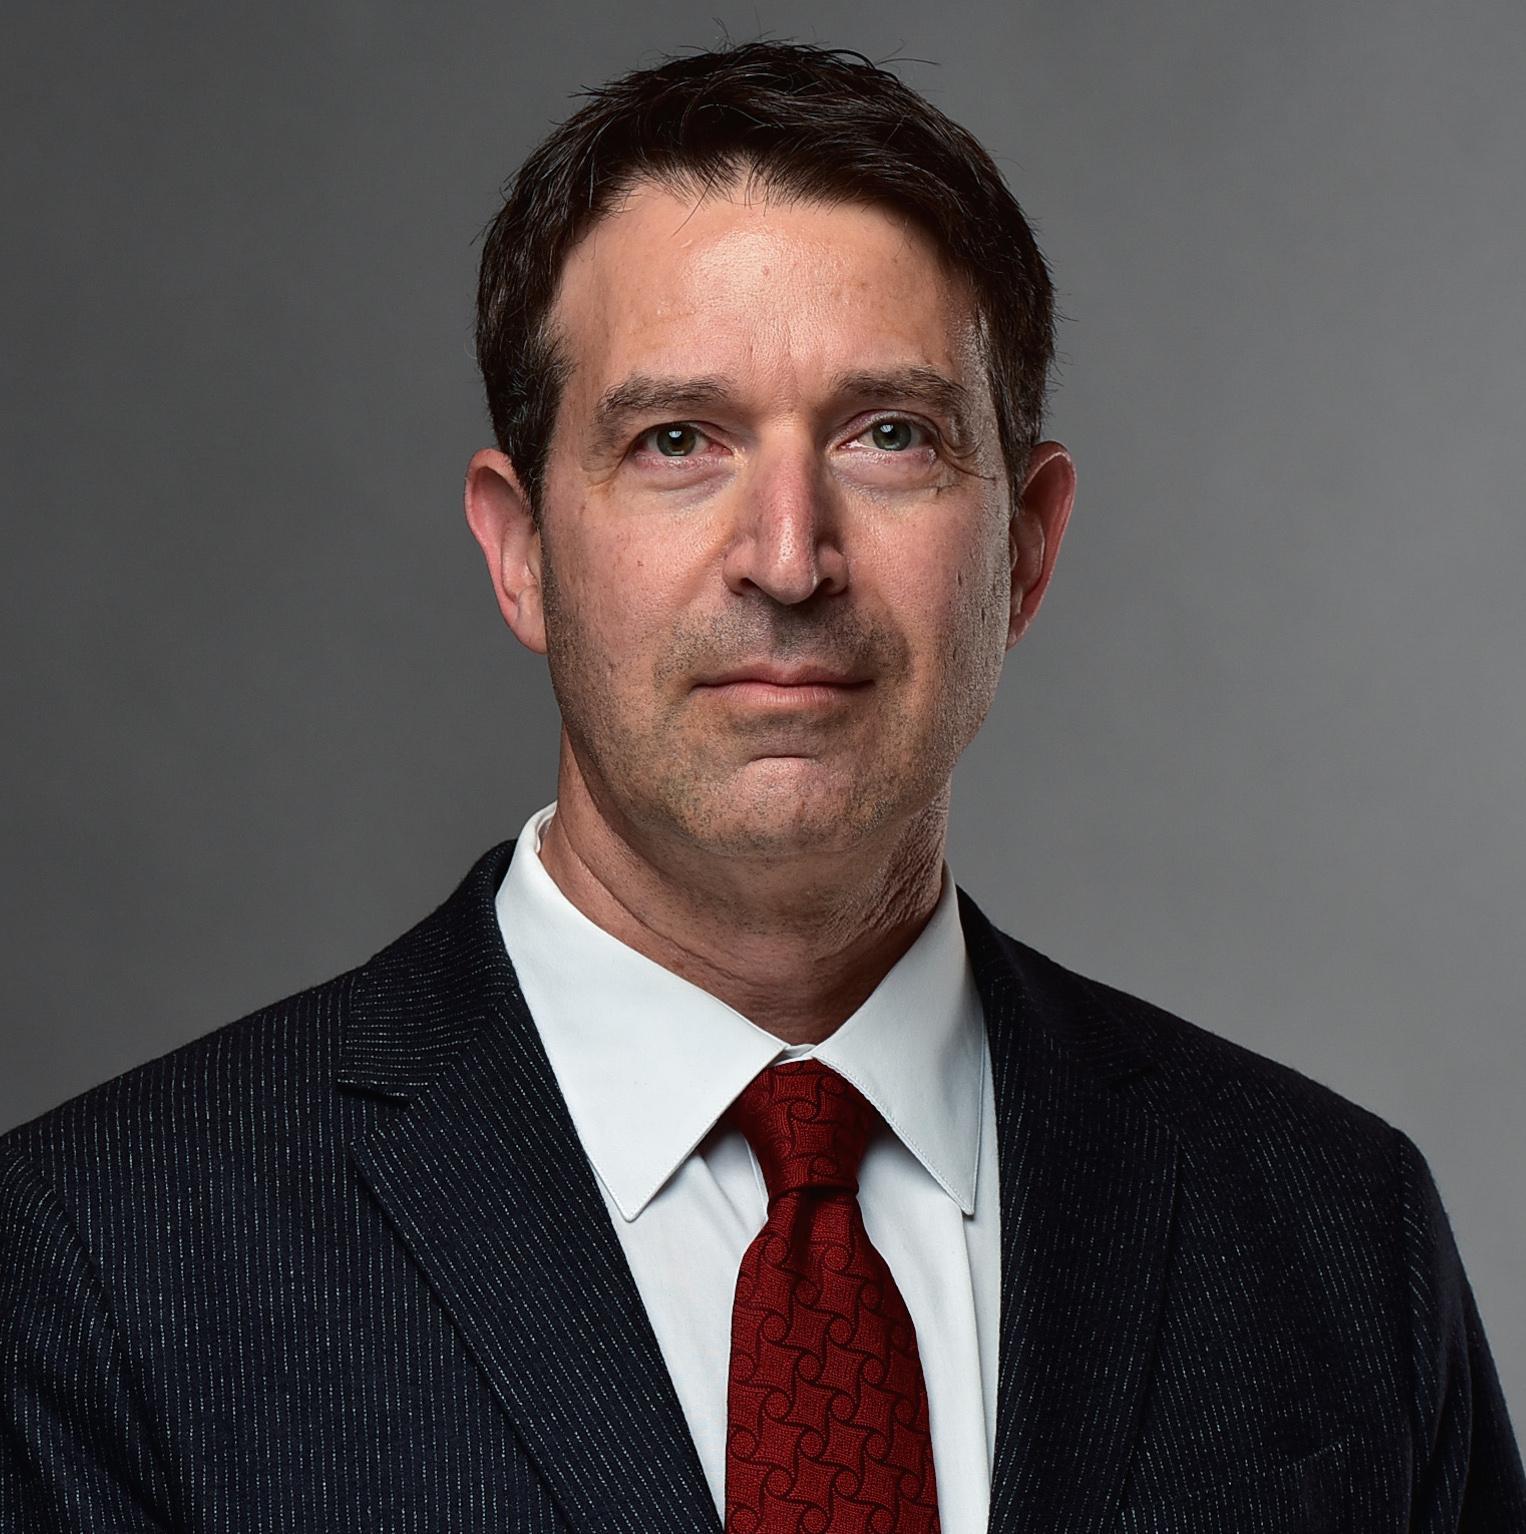 MATTHEW GOCHMAN Insurance Agent